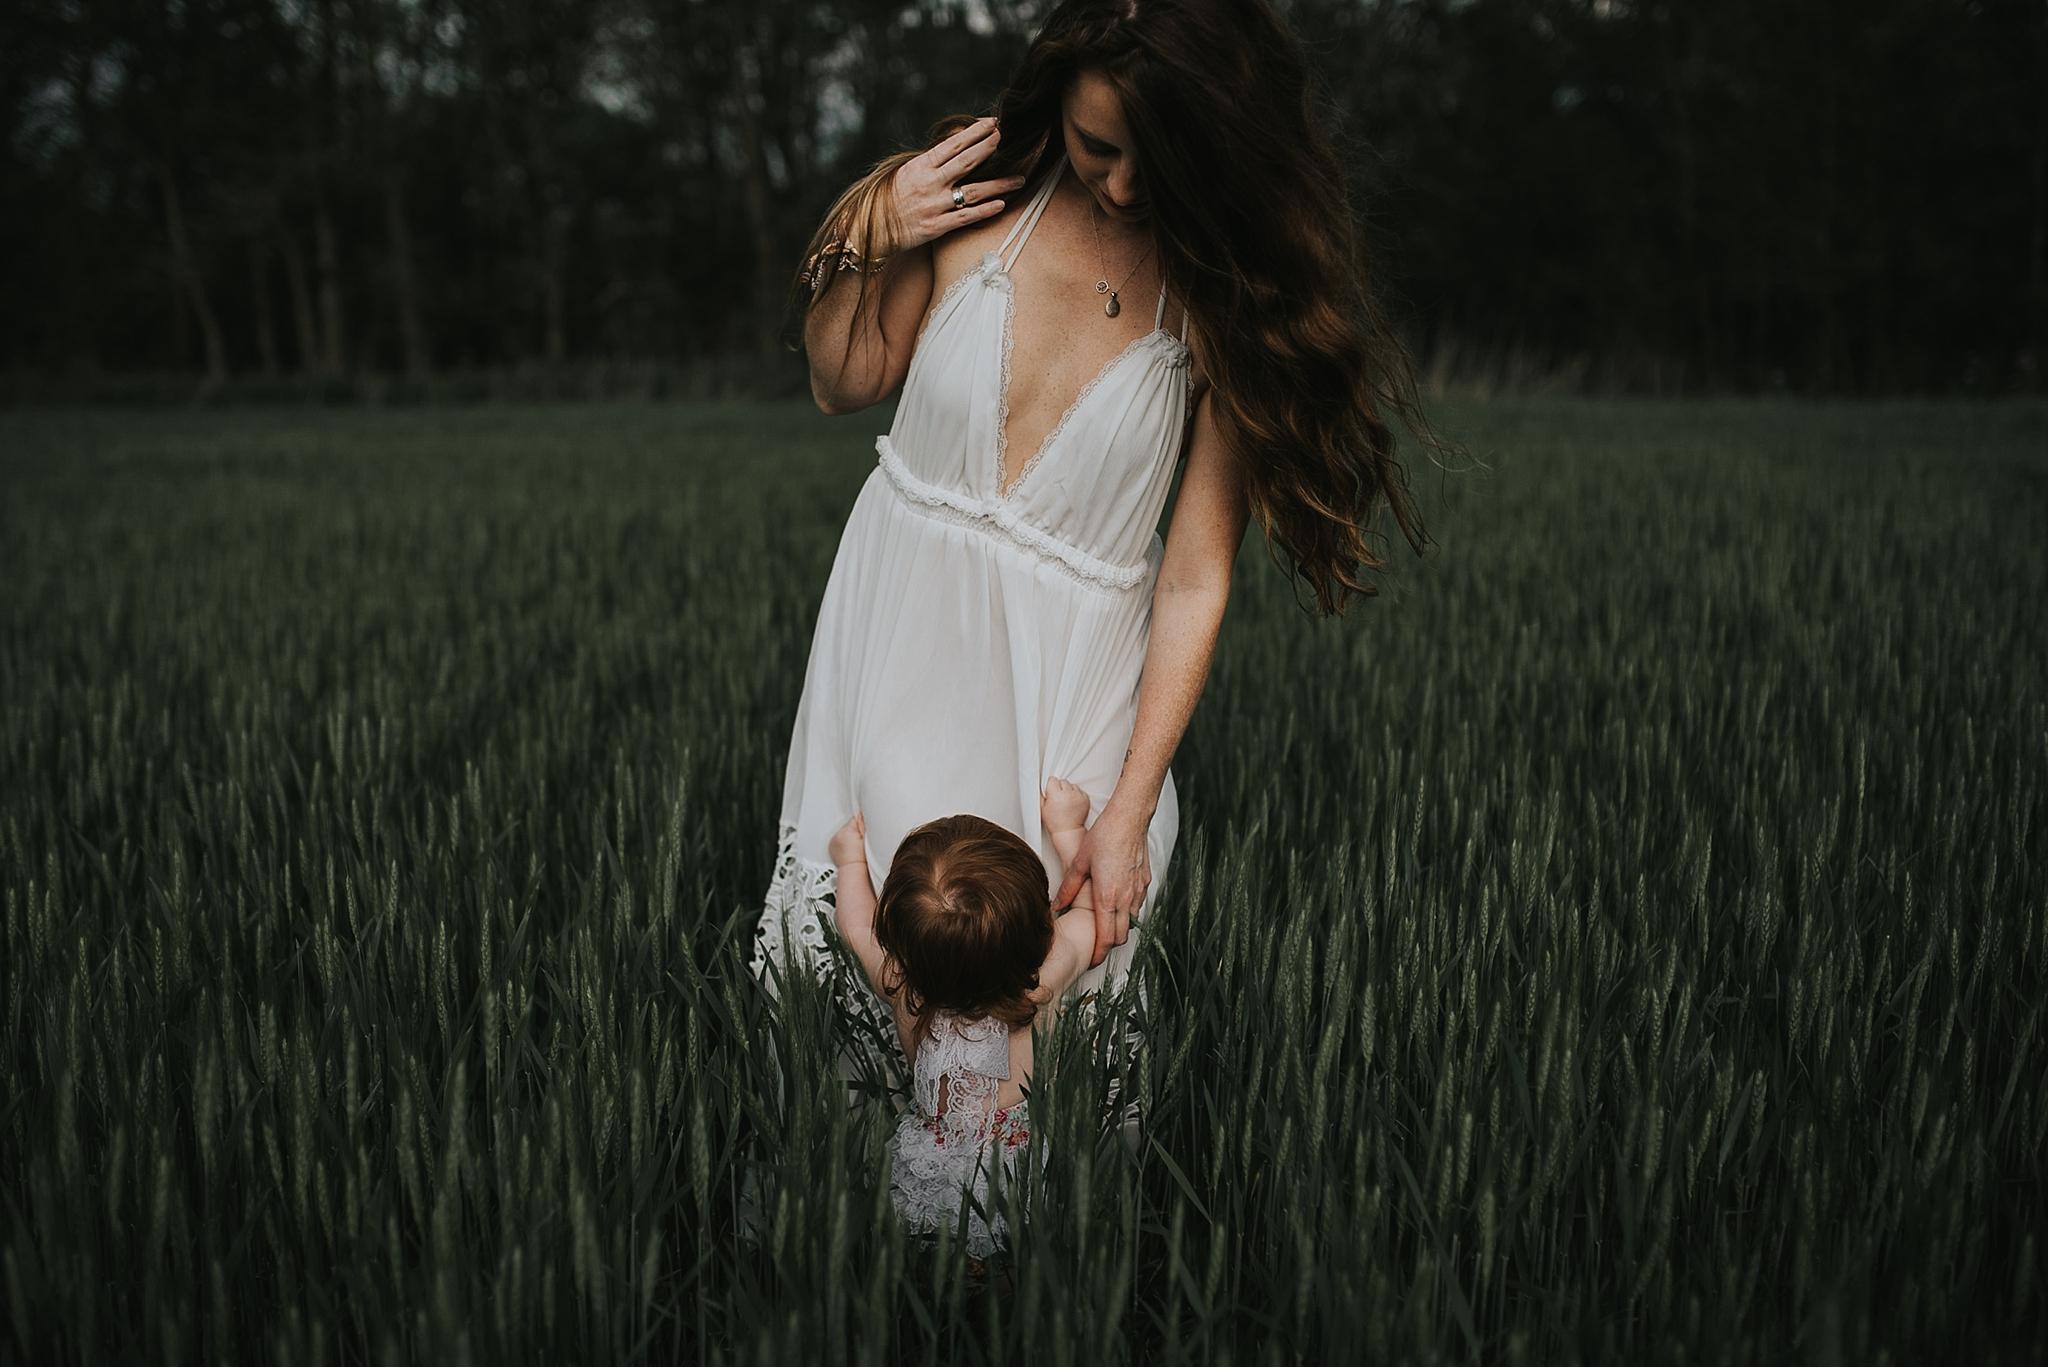 twyla jones photography - mother daughter - field and forest-4294_treasure coast florida.jpg